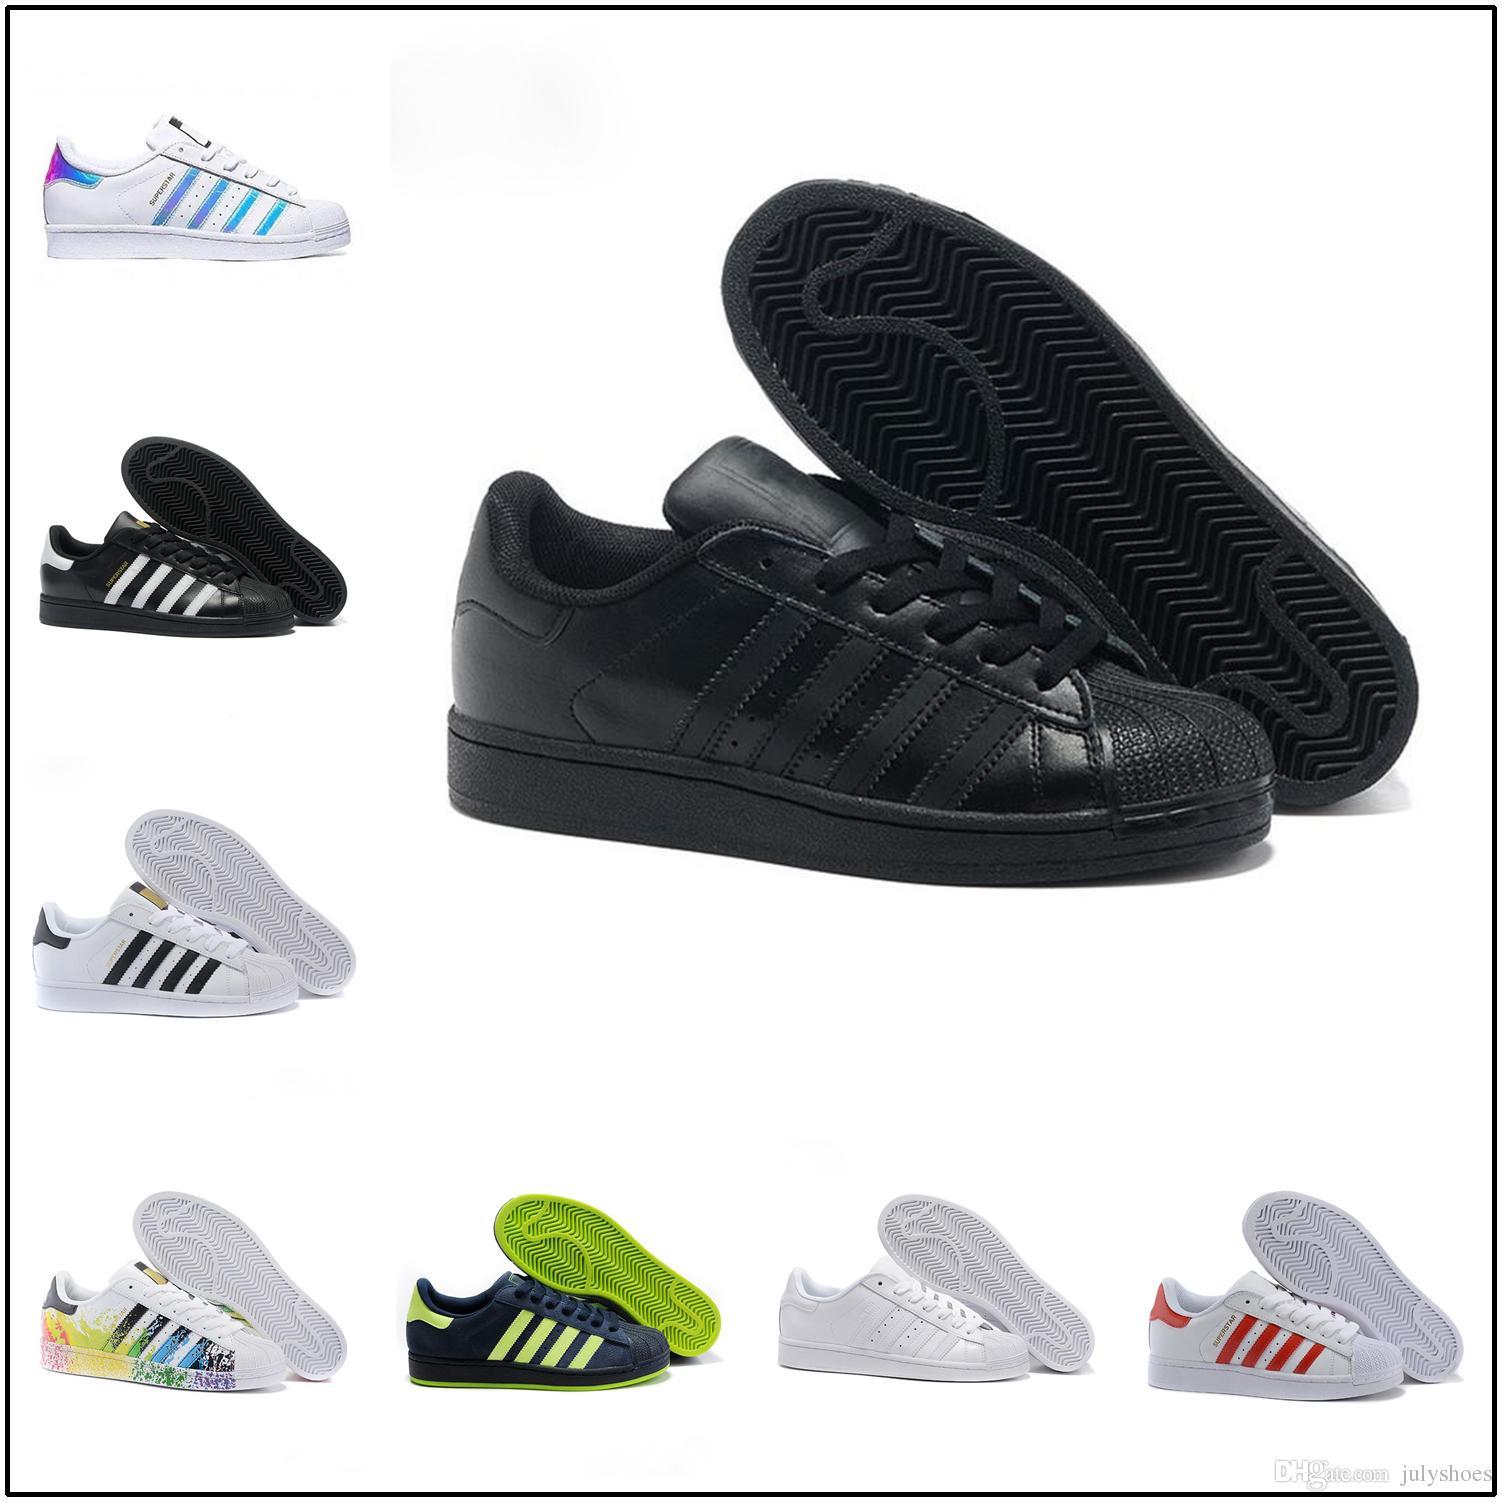 Superstar Allstar Hommes Femmes Marche Appartements Acheter Superstar Nouvelles De Femme Couleurs 2019 Chaussures Adidas Sneakers 15 Smith Chaussures 9EHeIbW2DY